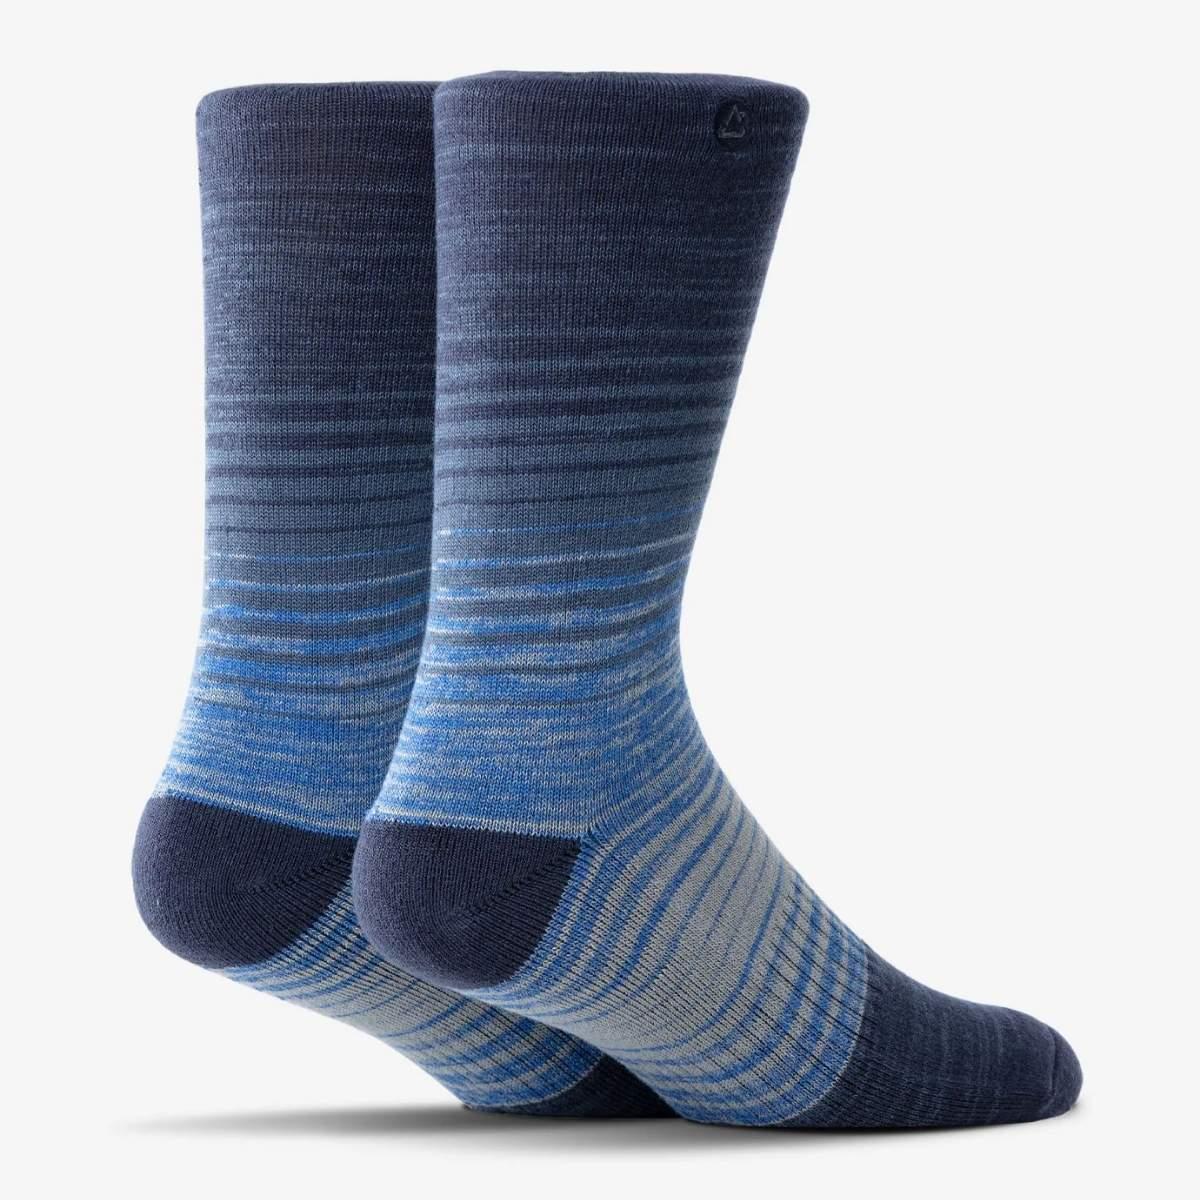 TravisMathew 2021 So Spliced Crew Sock